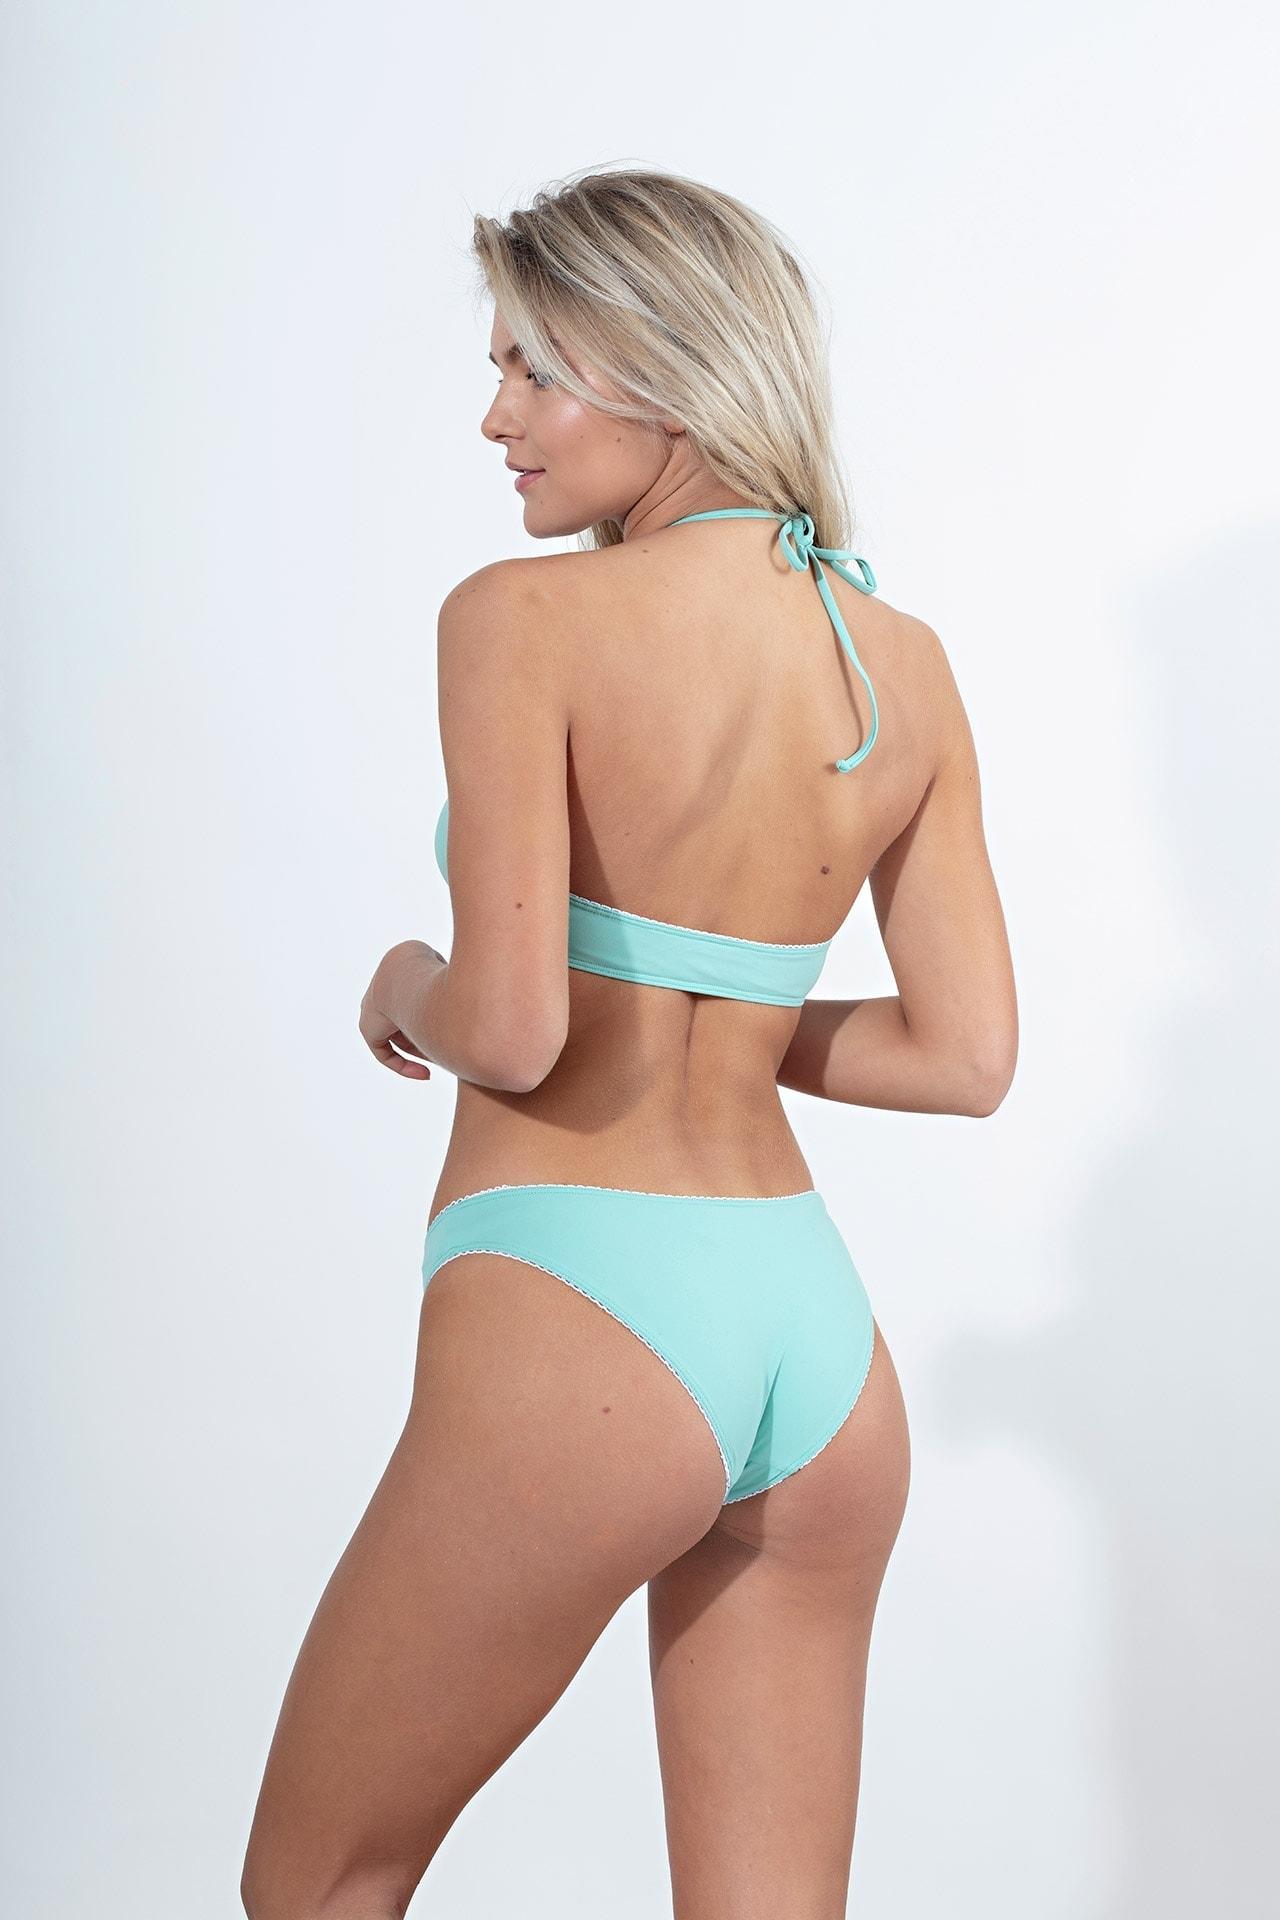 bikini slip σε μέντα ματ χρώμα 80's με εφε κέντημα στο τελείωμα